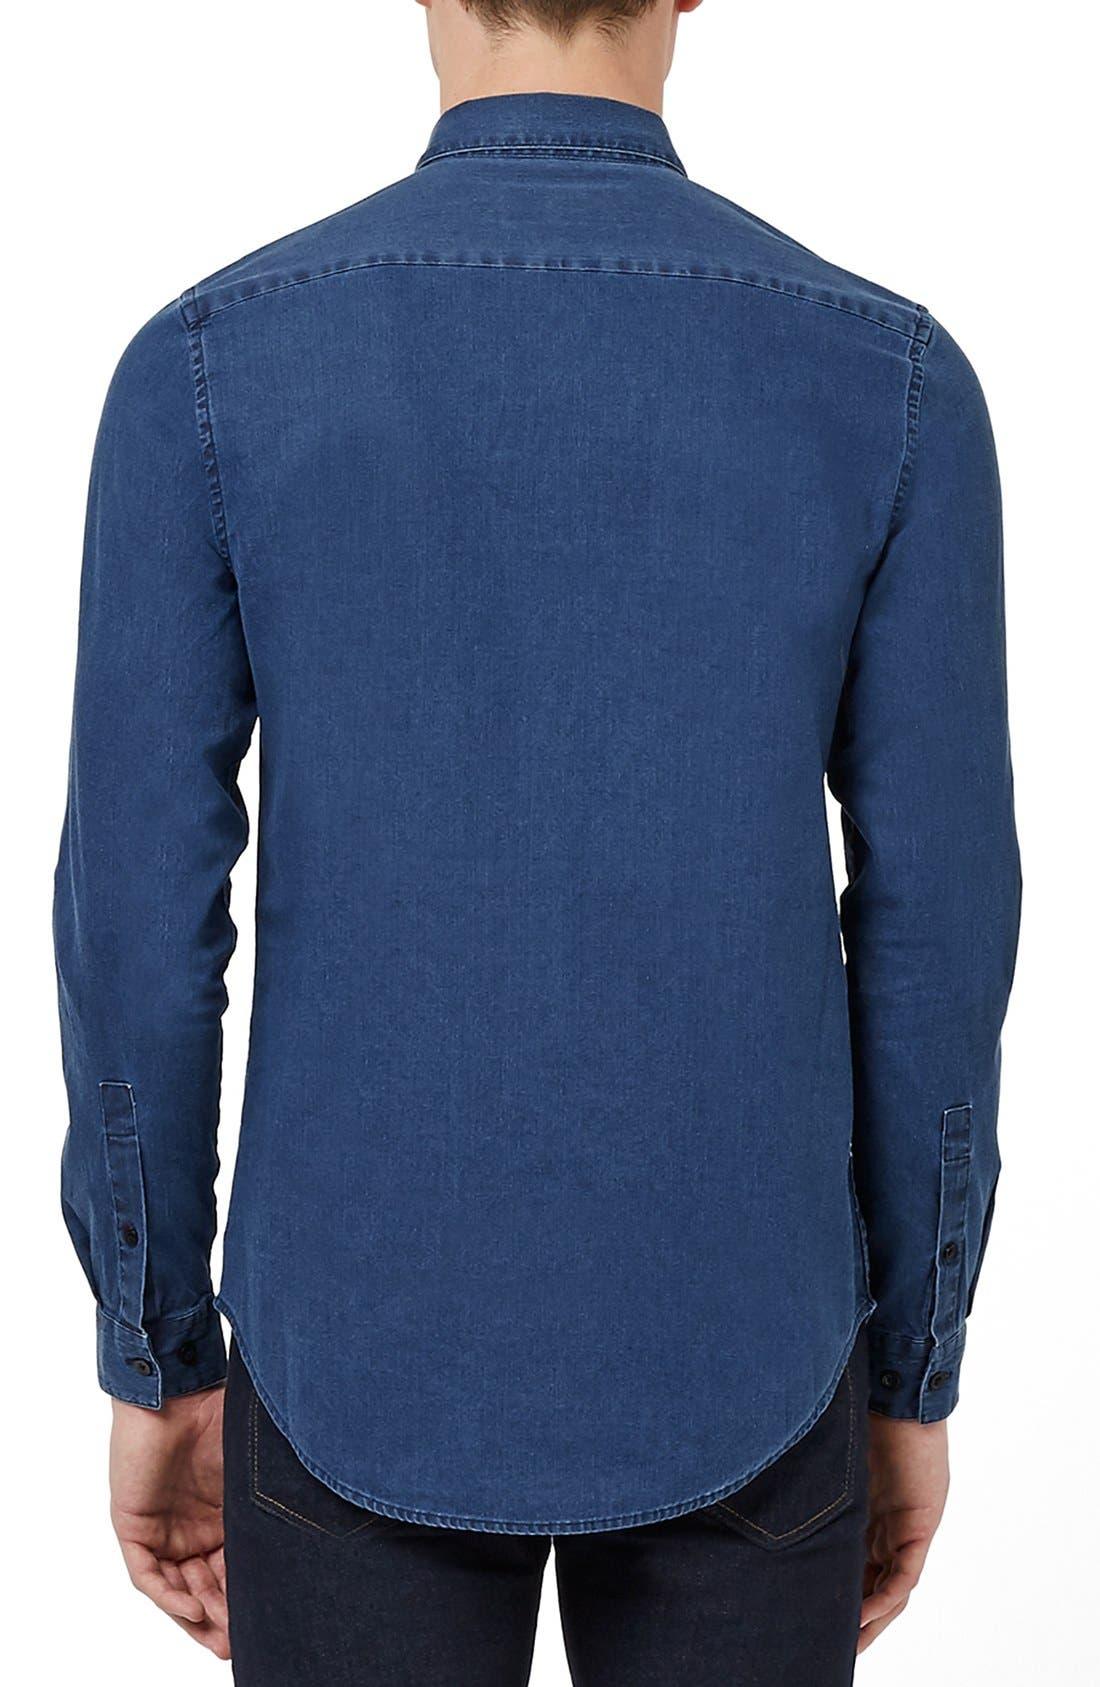 TOPMAN, Denim Shirt, Alternate thumbnail 4, color, 401